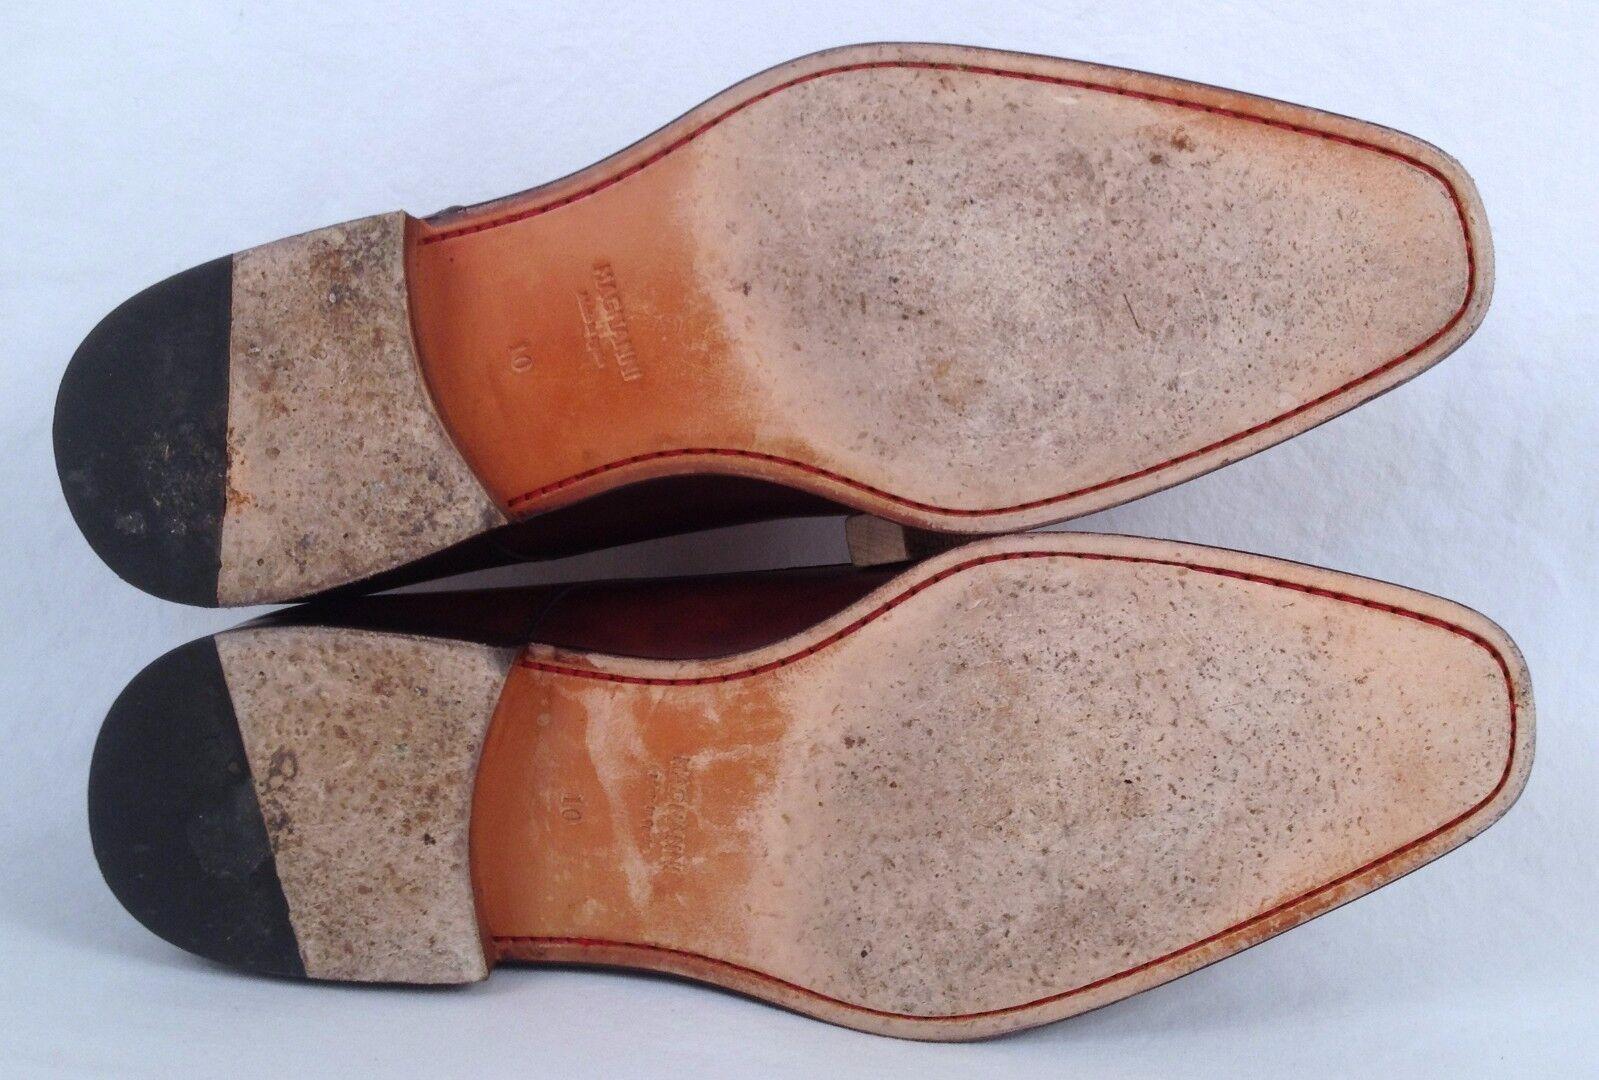 Magnanni 'Colo' Plain Toe Derby- Brown- Size 10 (M5) M   (M5) 10 5d5f9f